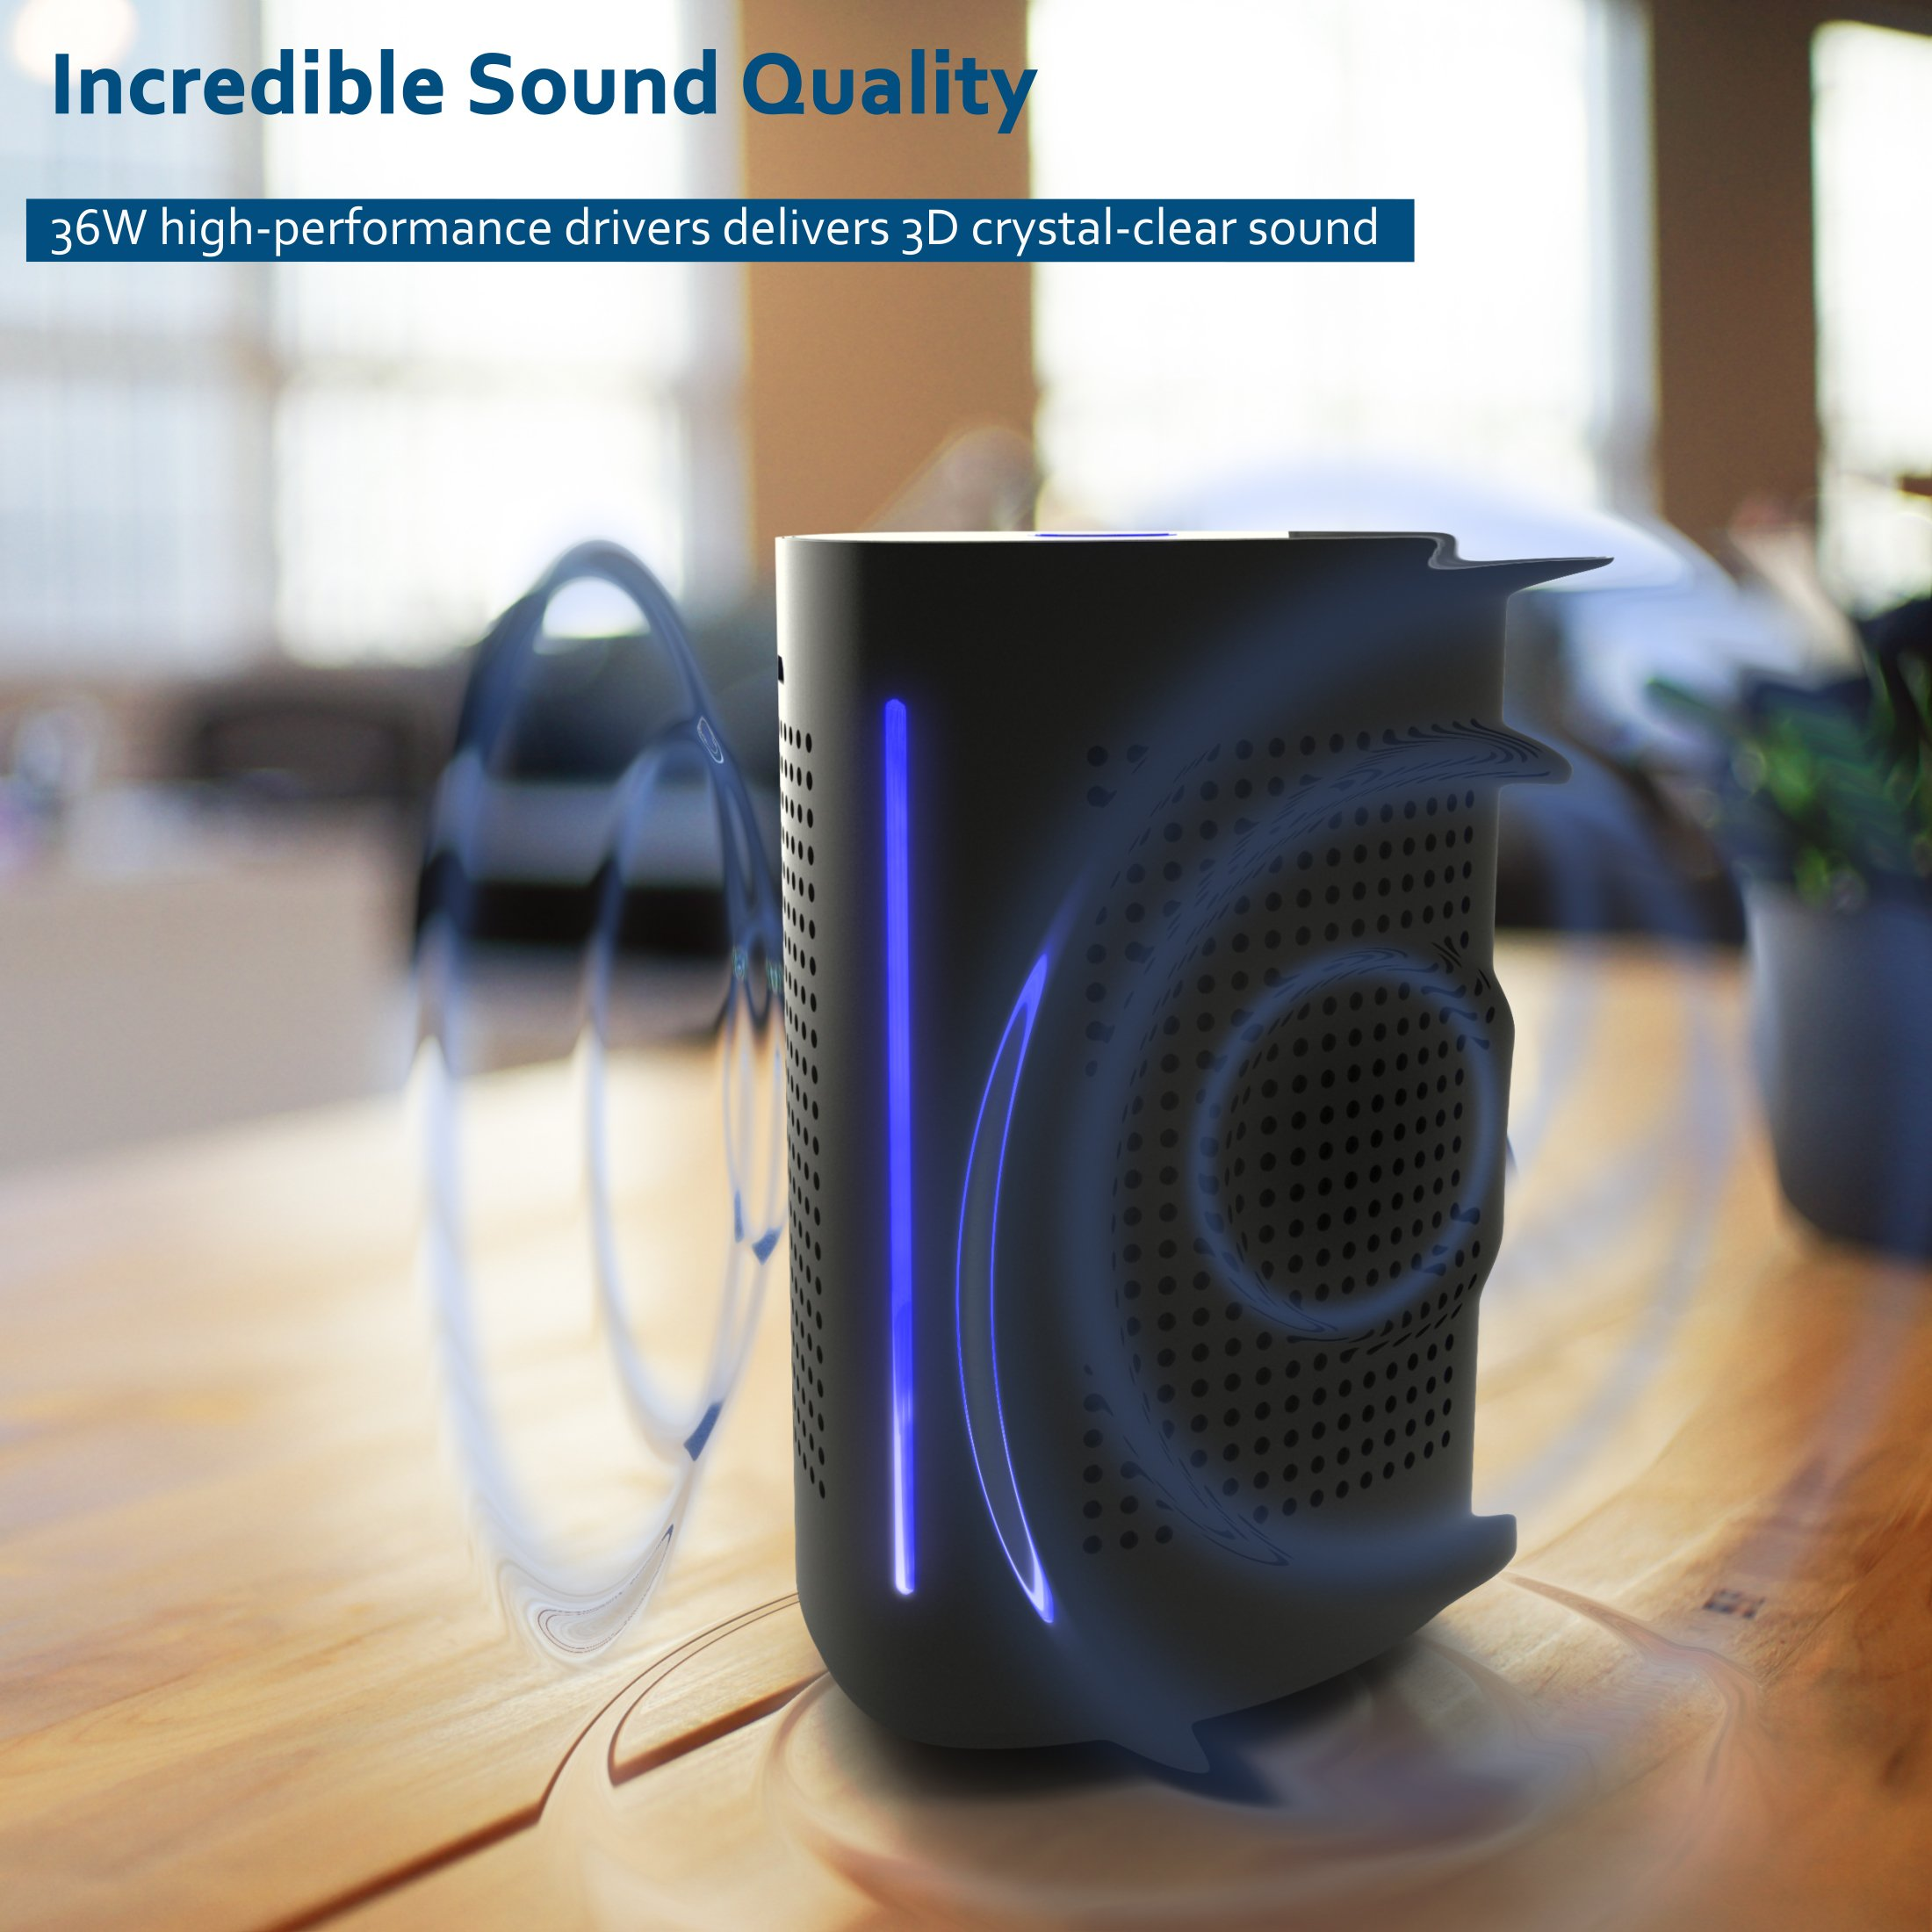 Bluetooth Computer Speaker – Wireless Bluetooth Speaker – Bluetooth Speaker for Women Men – Audio Bluetooth Speaker for iPhone Android Laptop – True Wireless Speakers – Portable Bluetooth Speakers by Bitzen (Image #4)